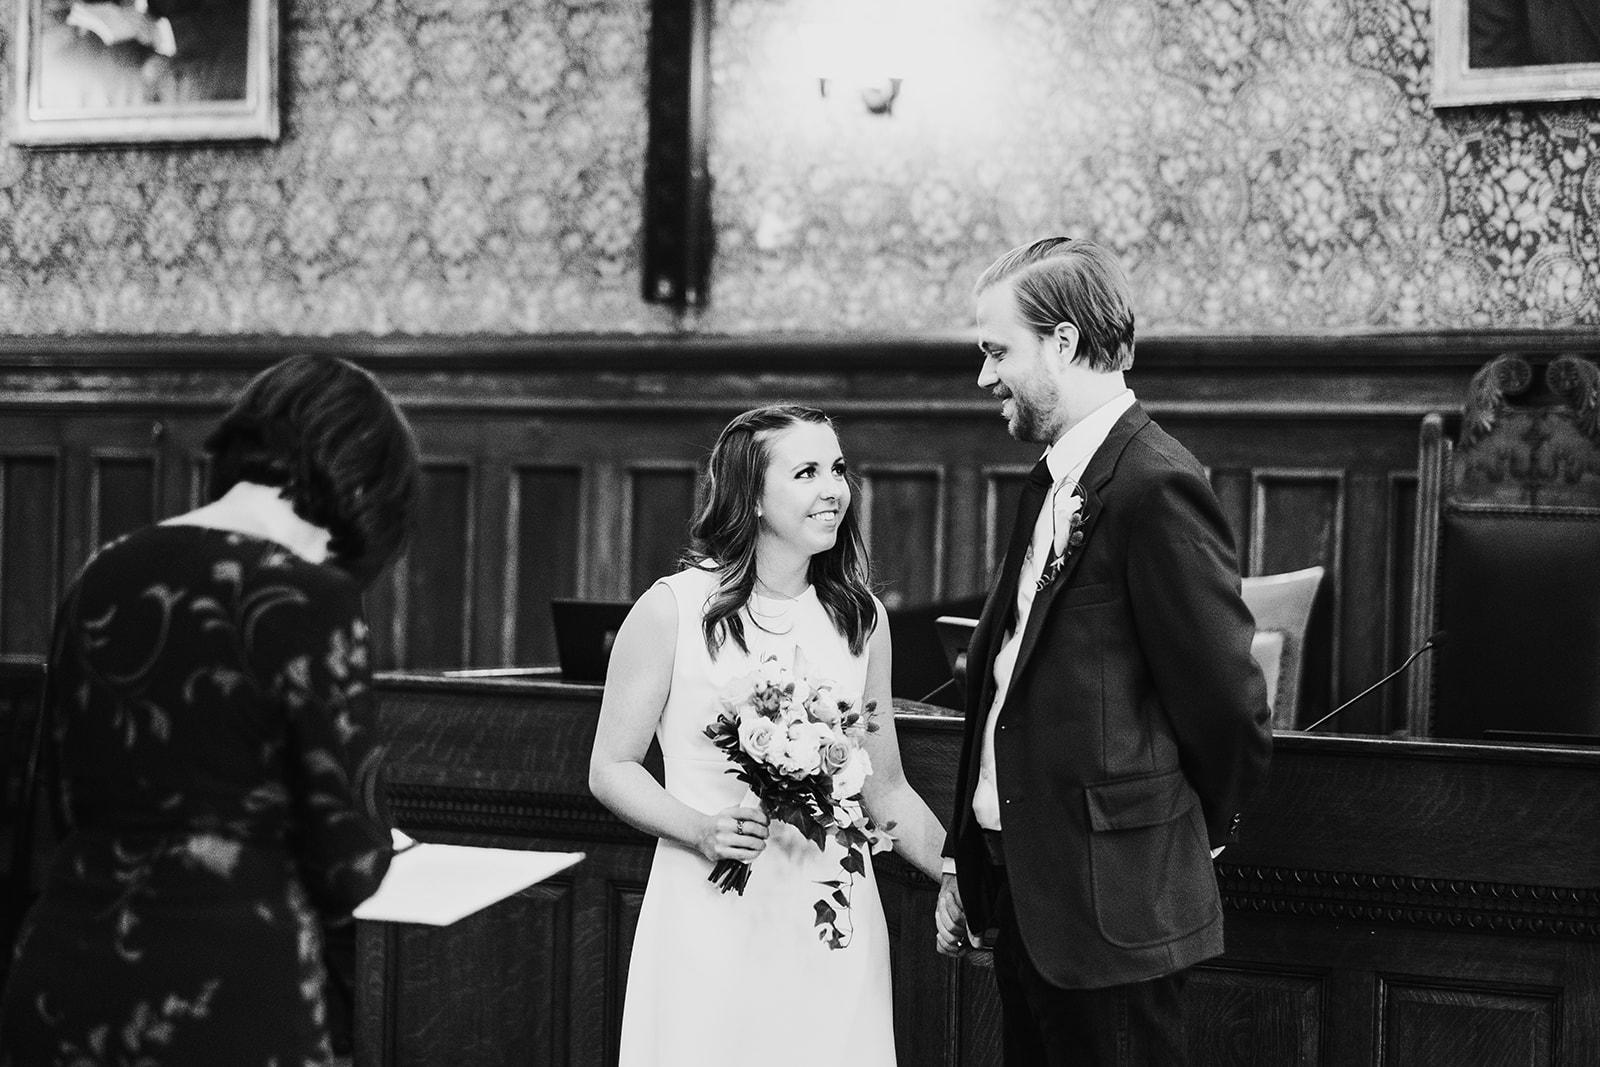 Wedding_Francis_Boucher_Elopement_Cambridge_MA_2018-52.jpg